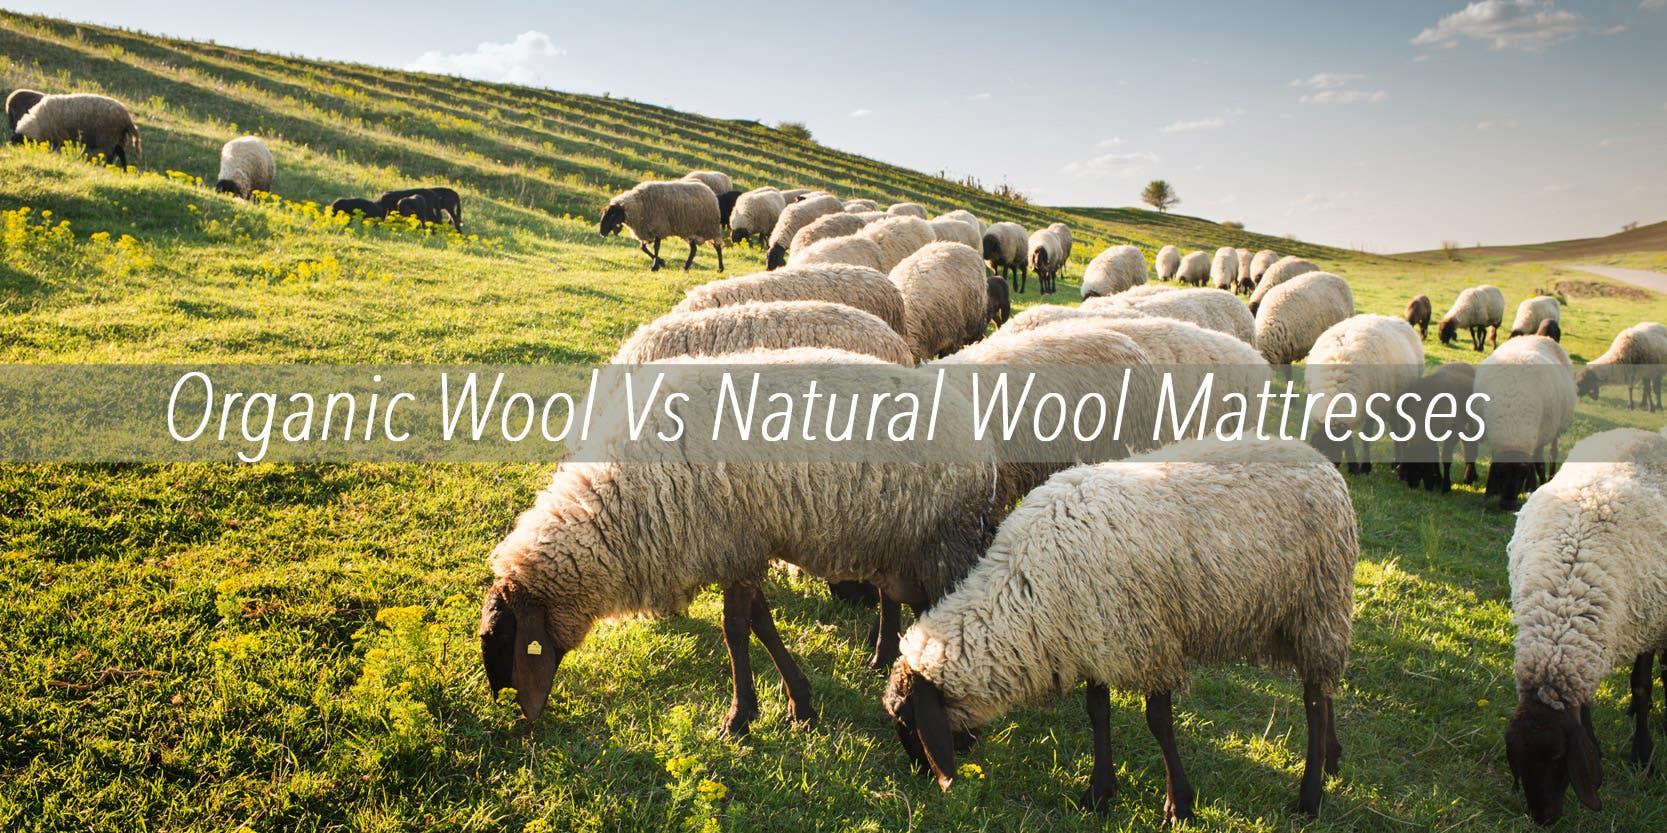 Organic Wool Verses Natural Wool Mattresses